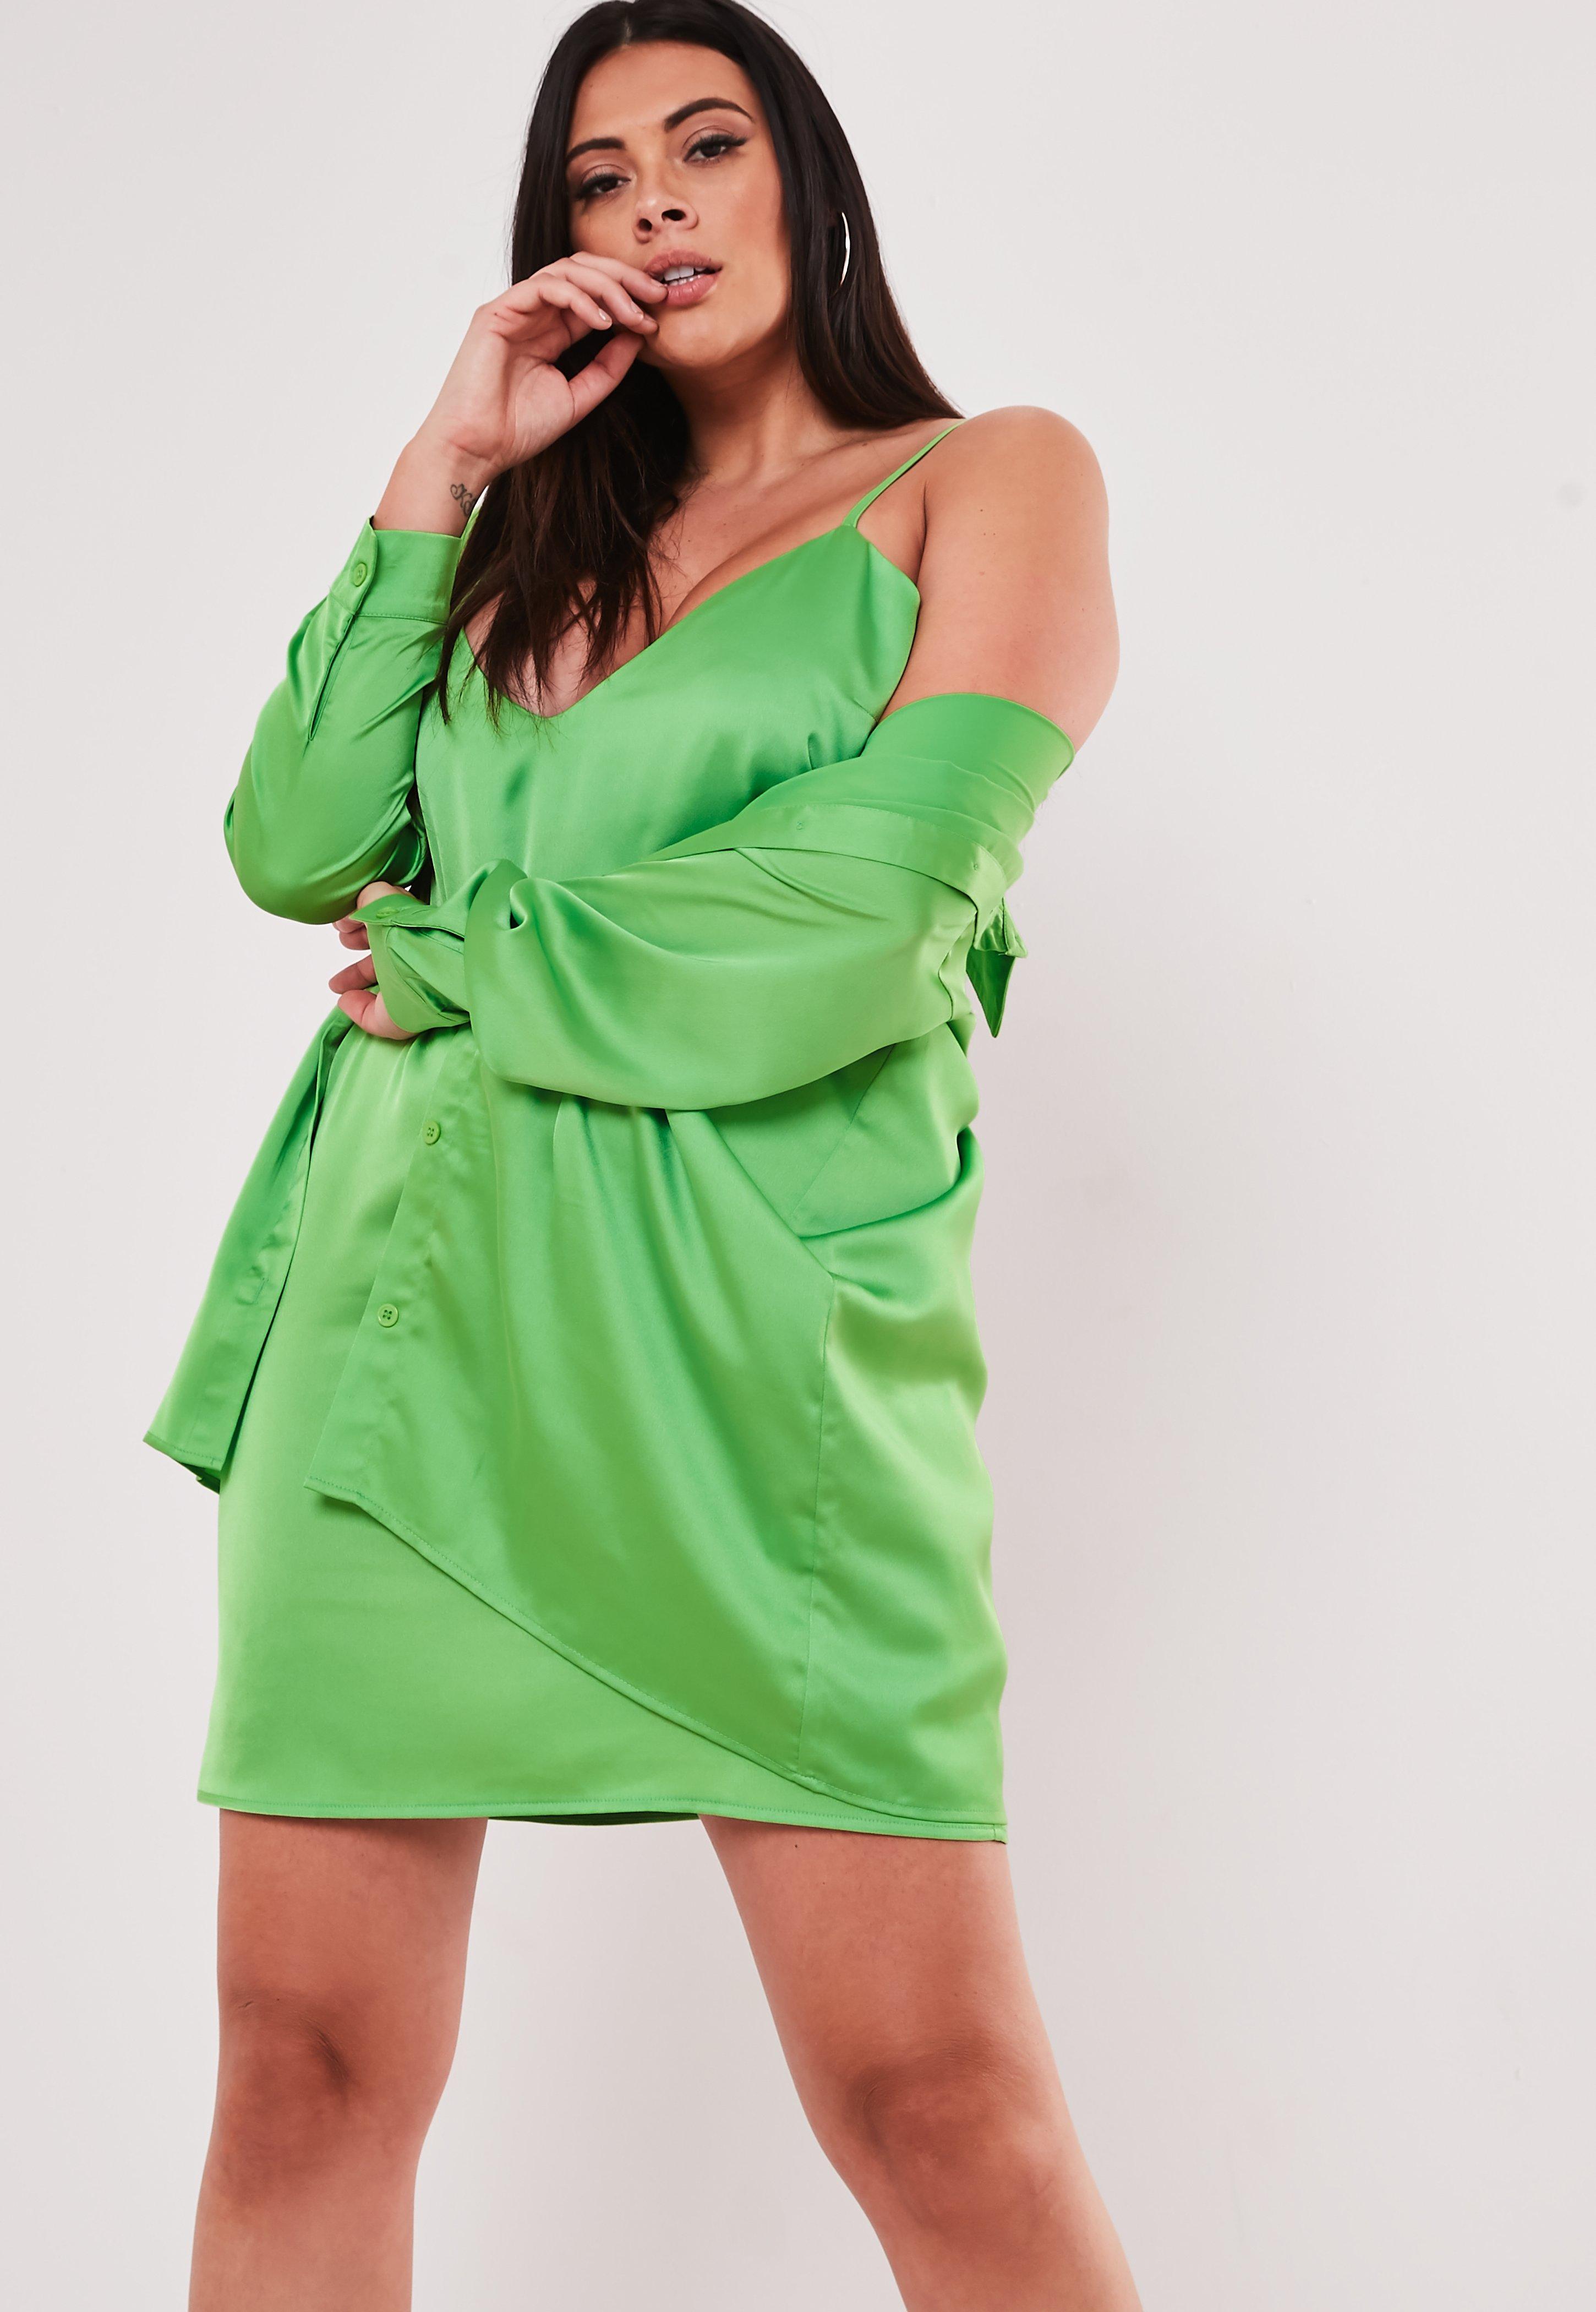 Plus Size Lime Co Ord Satin Shirt Dress